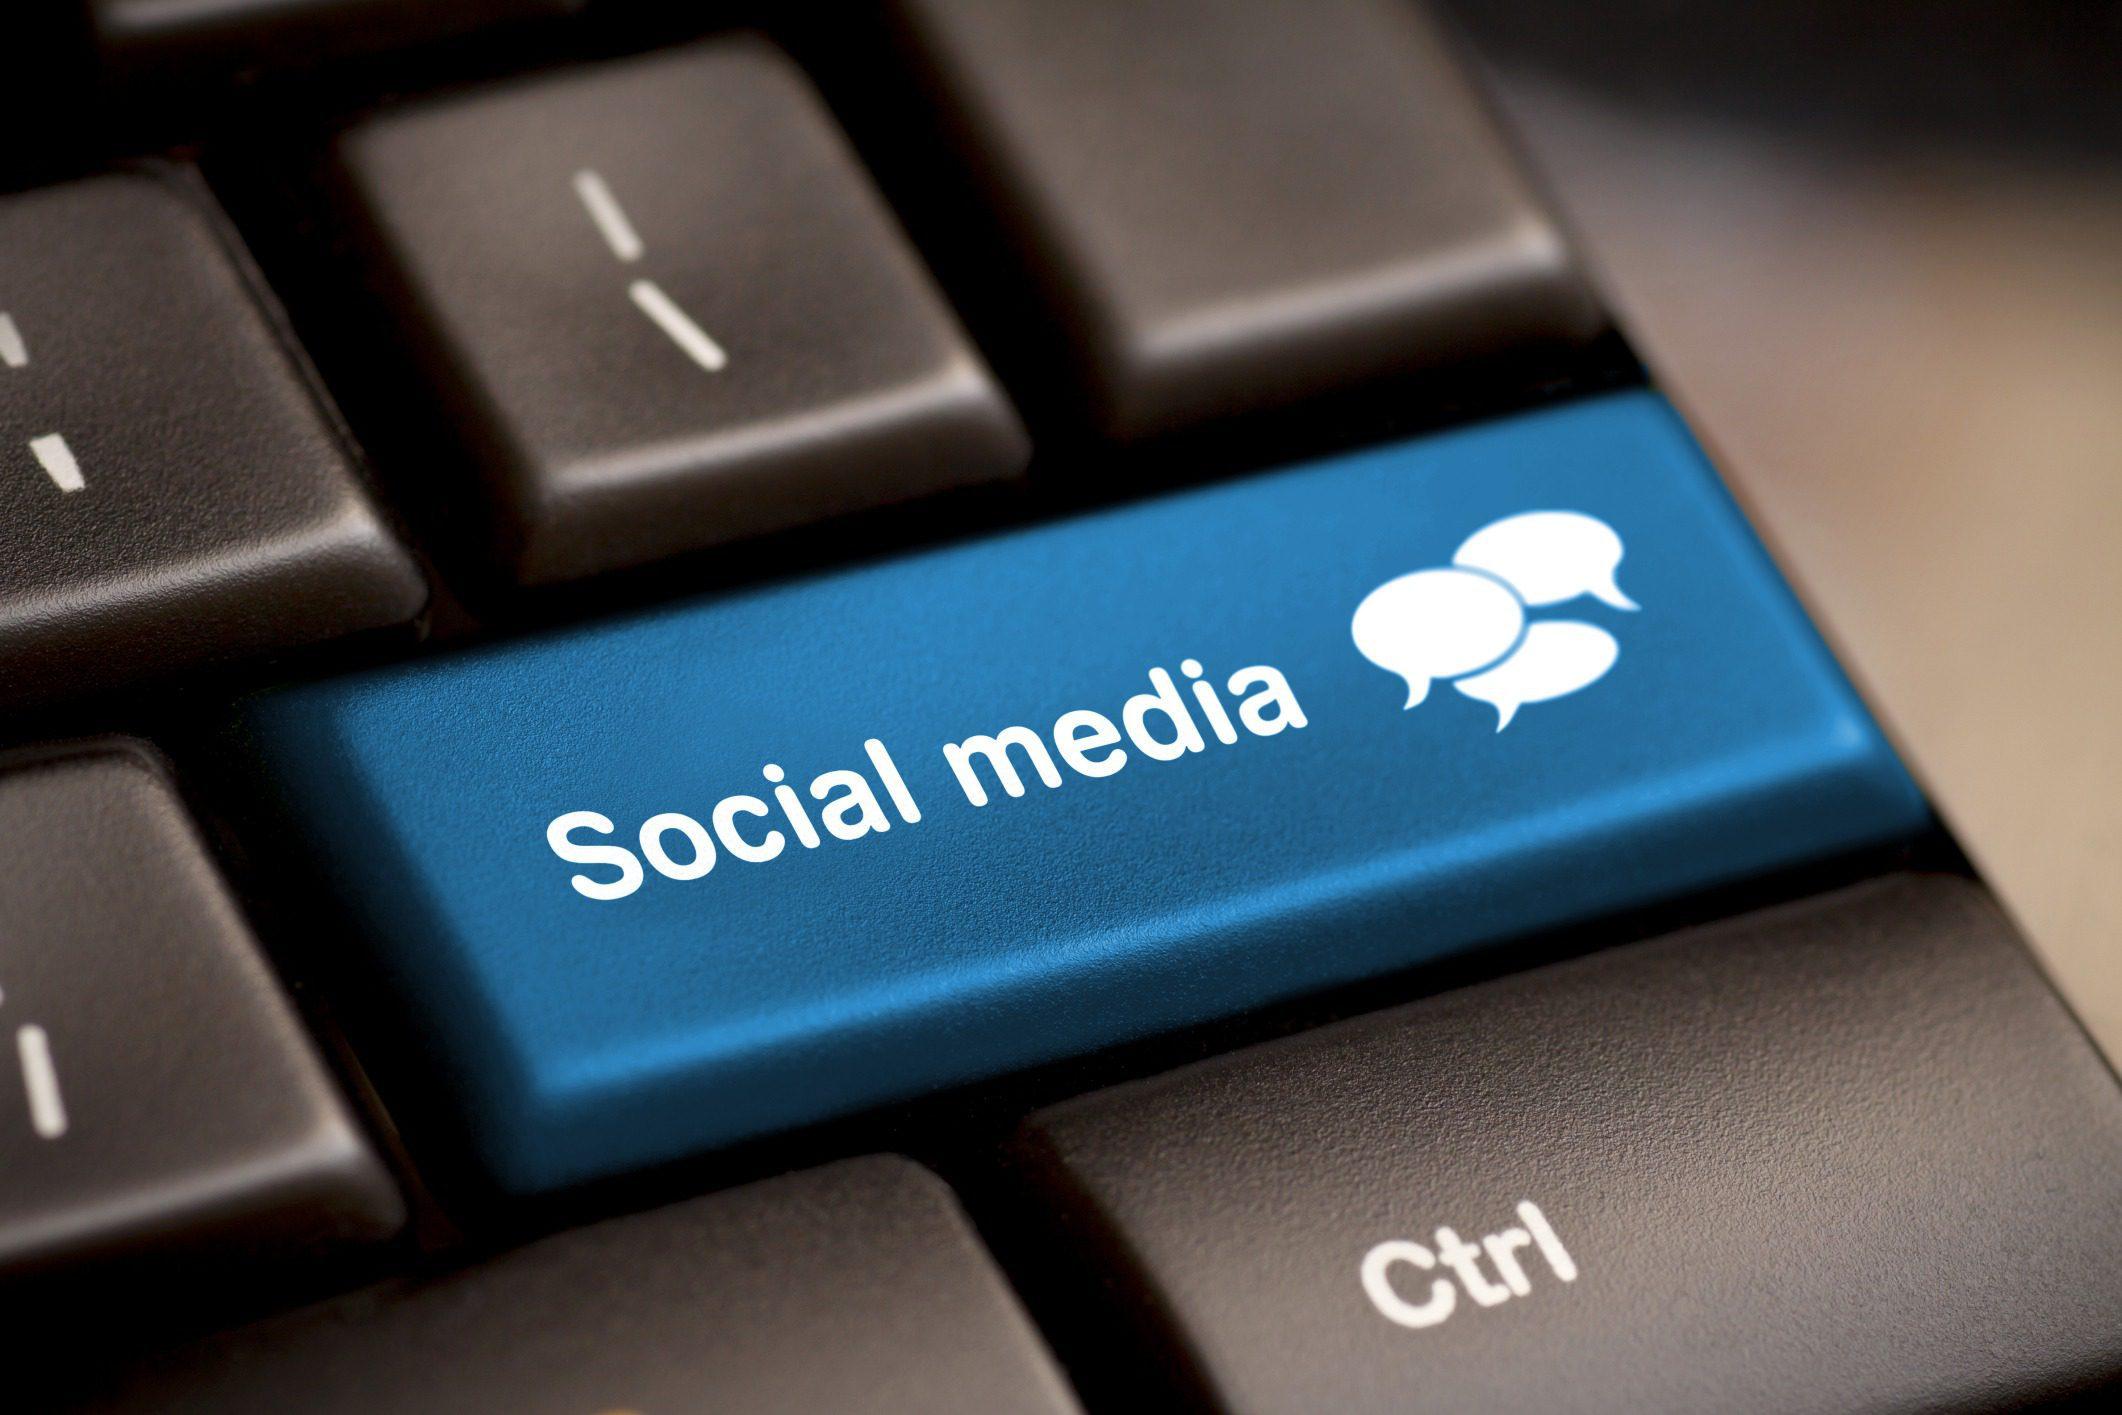 Social Media After Separation